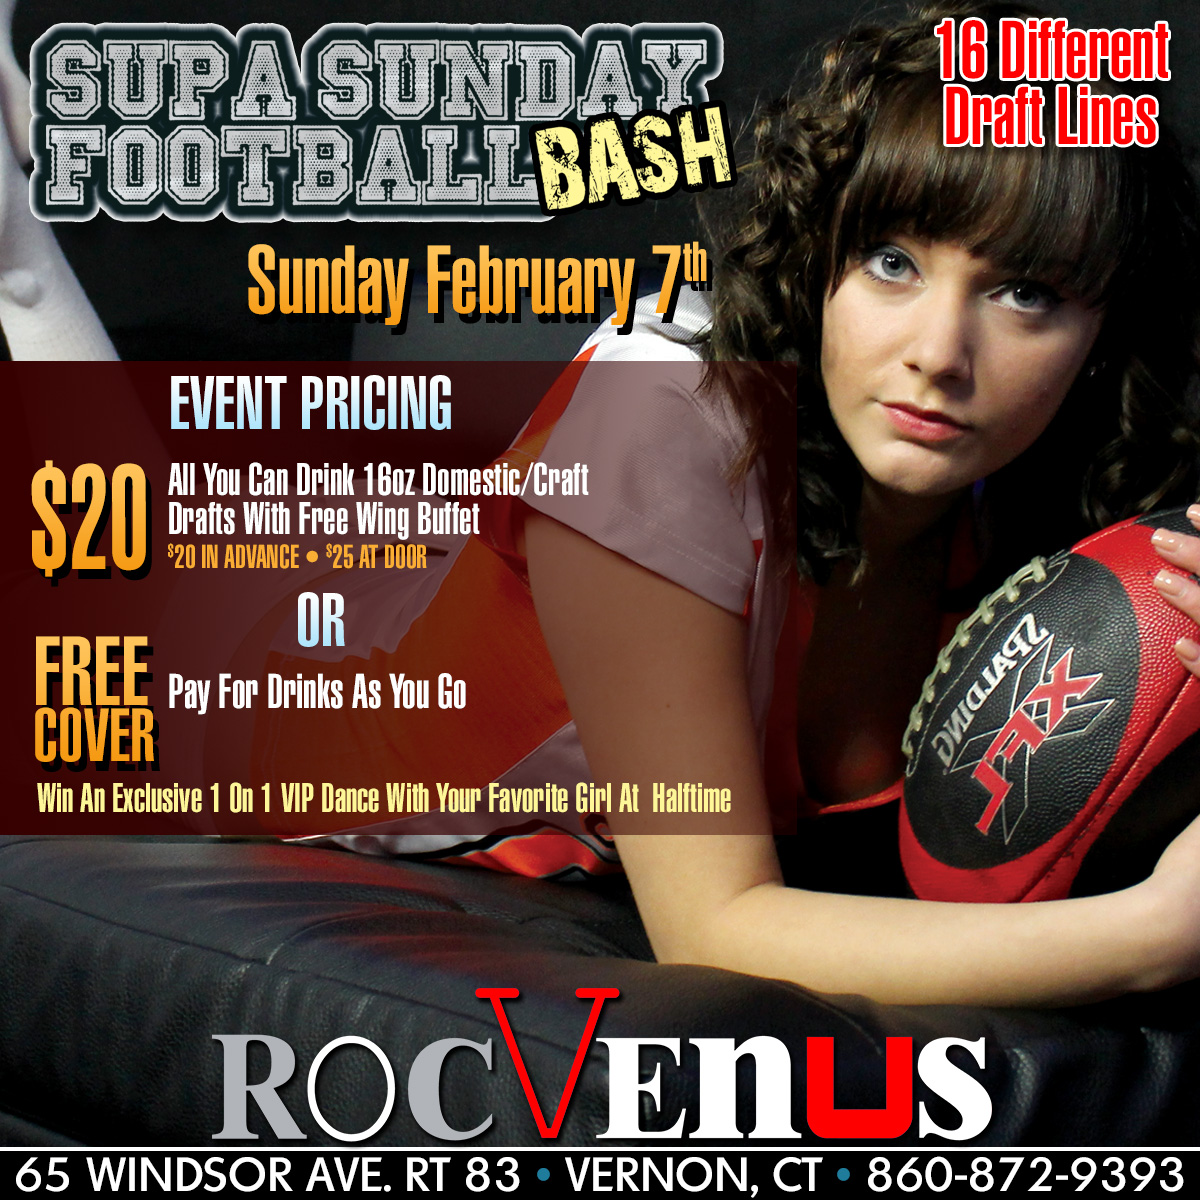 Supa Sunday Football Bash| RocVenus Connecticut Strip Club